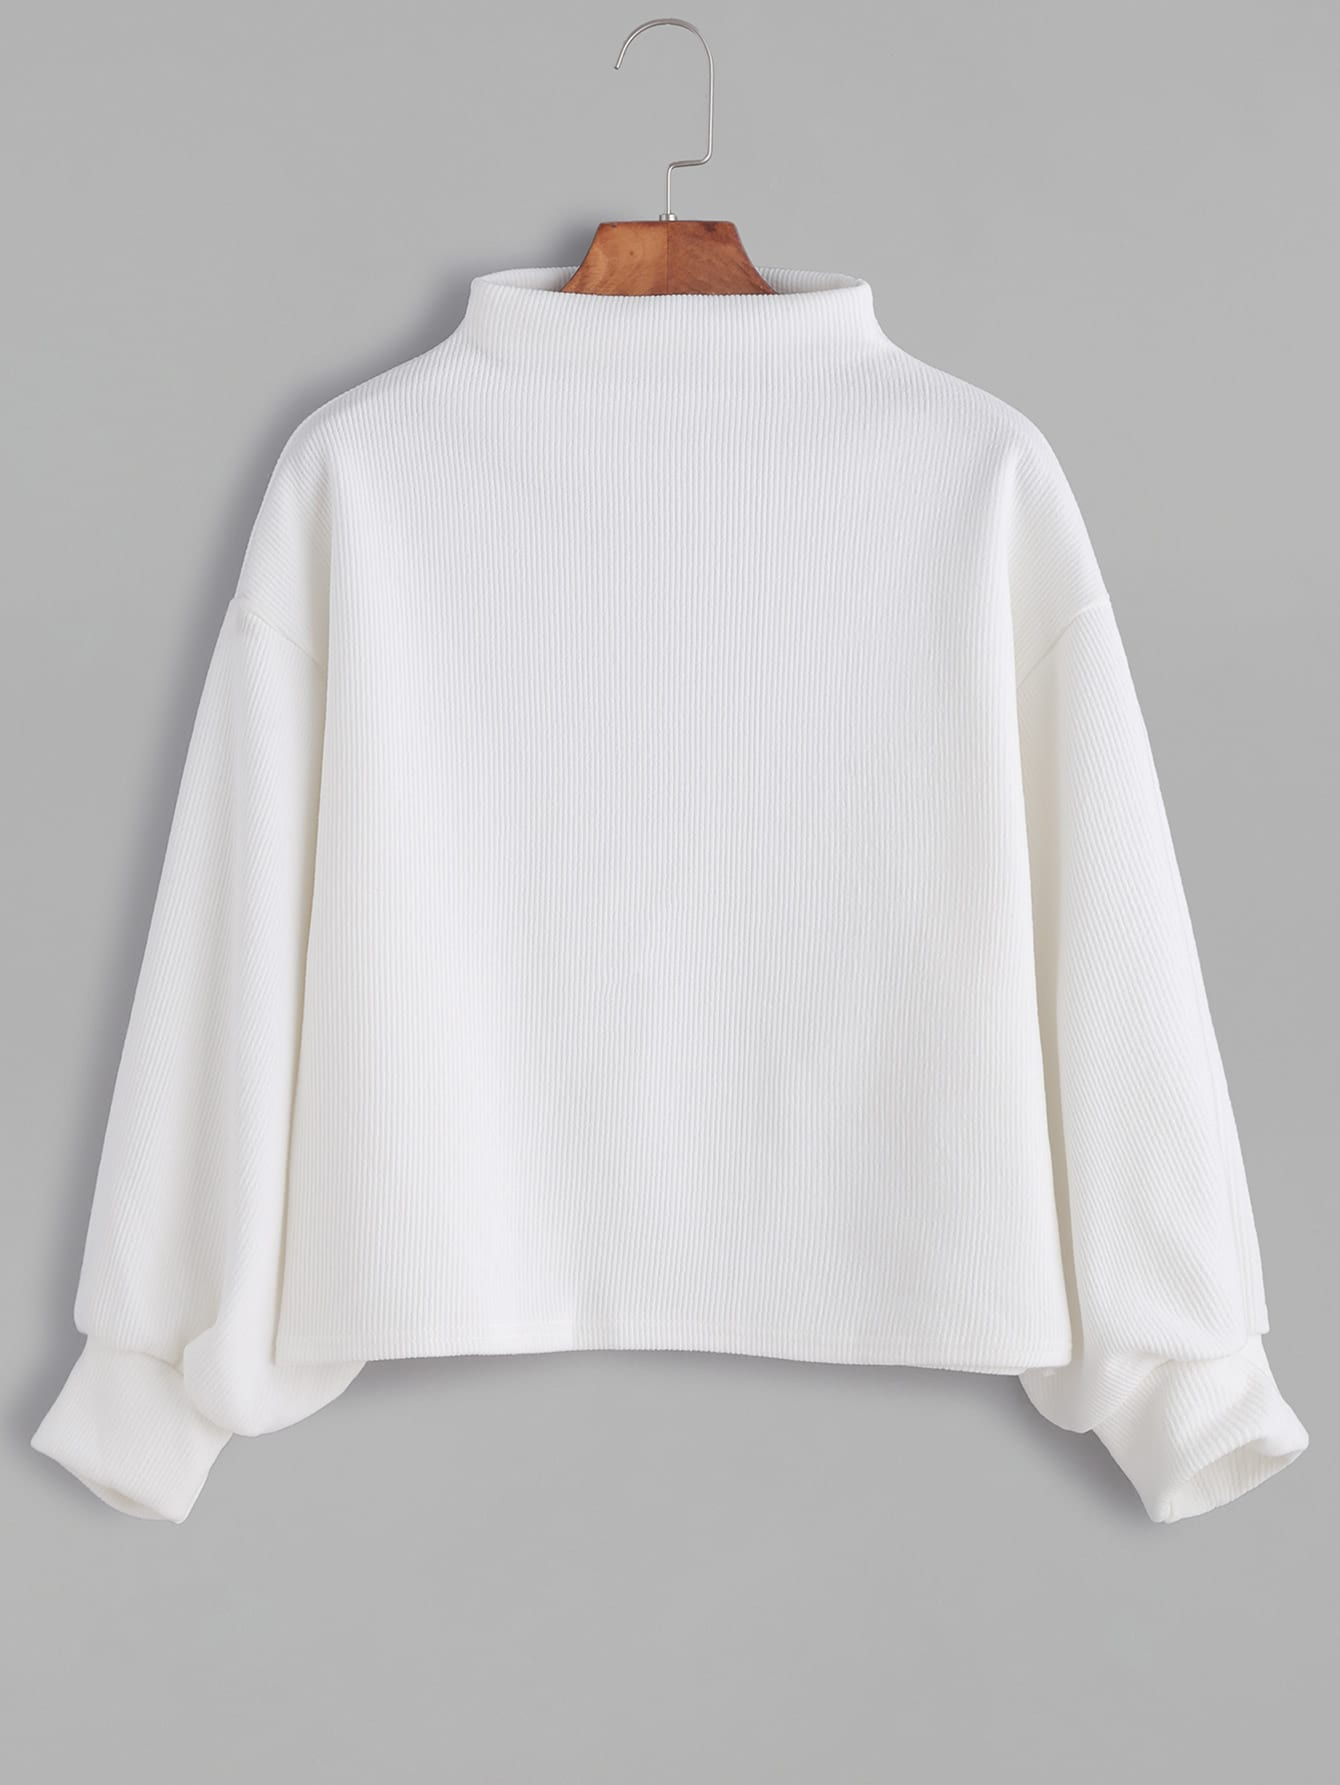 White Ribbed Lantern Sleeve Sweater sweater161103003